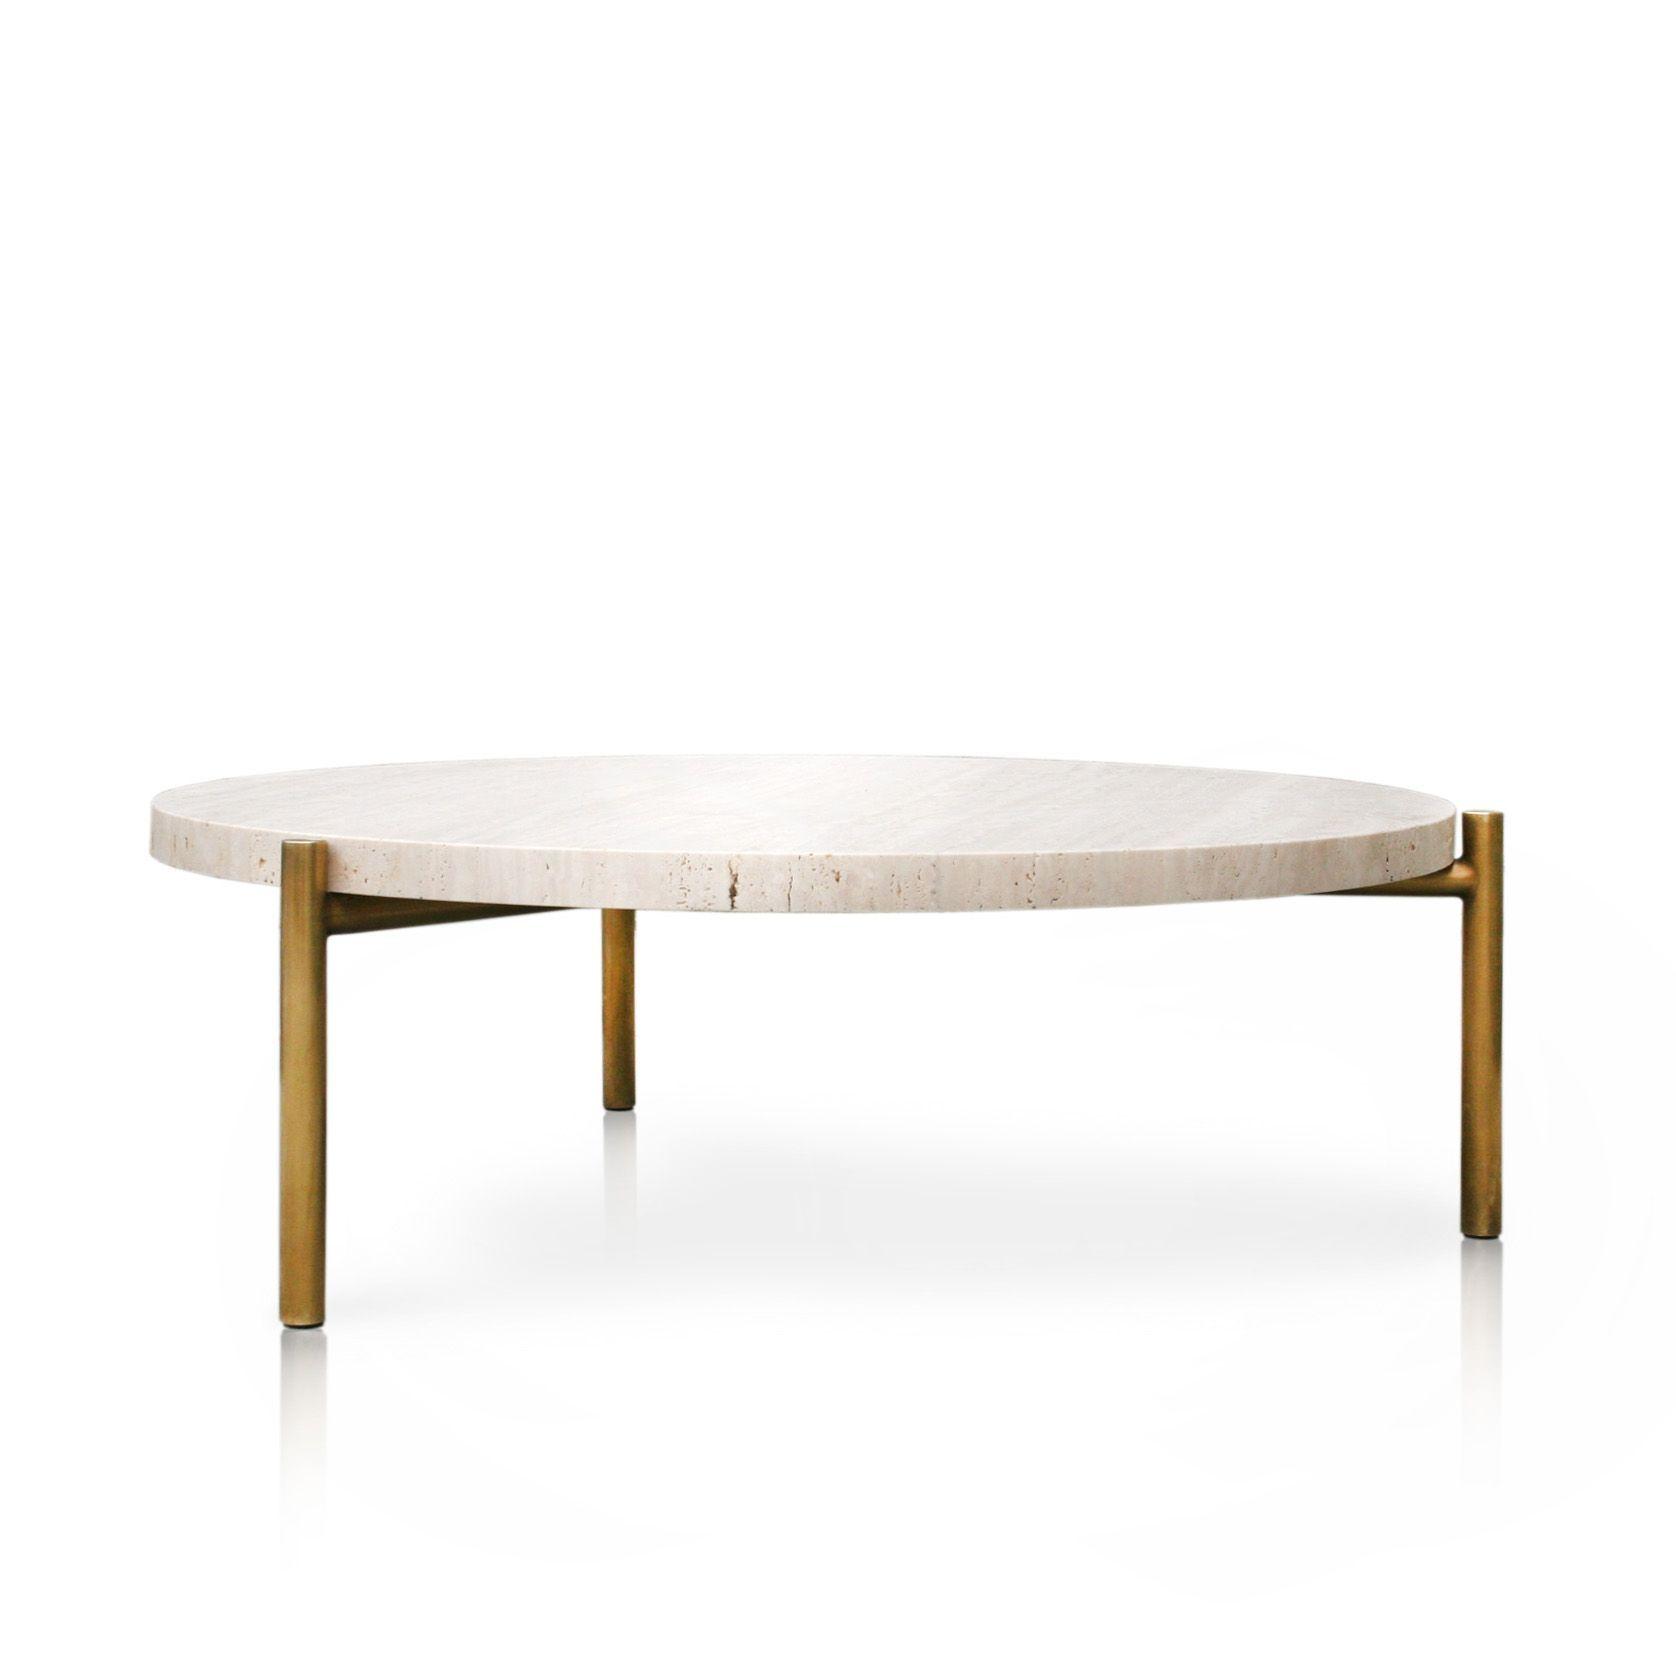 Travertine C Table 3 Leg Brass 40 Inch Coffee Table Travertine Coffee Table Home Coffee Tables [ 1676 x 1676 Pixel ]